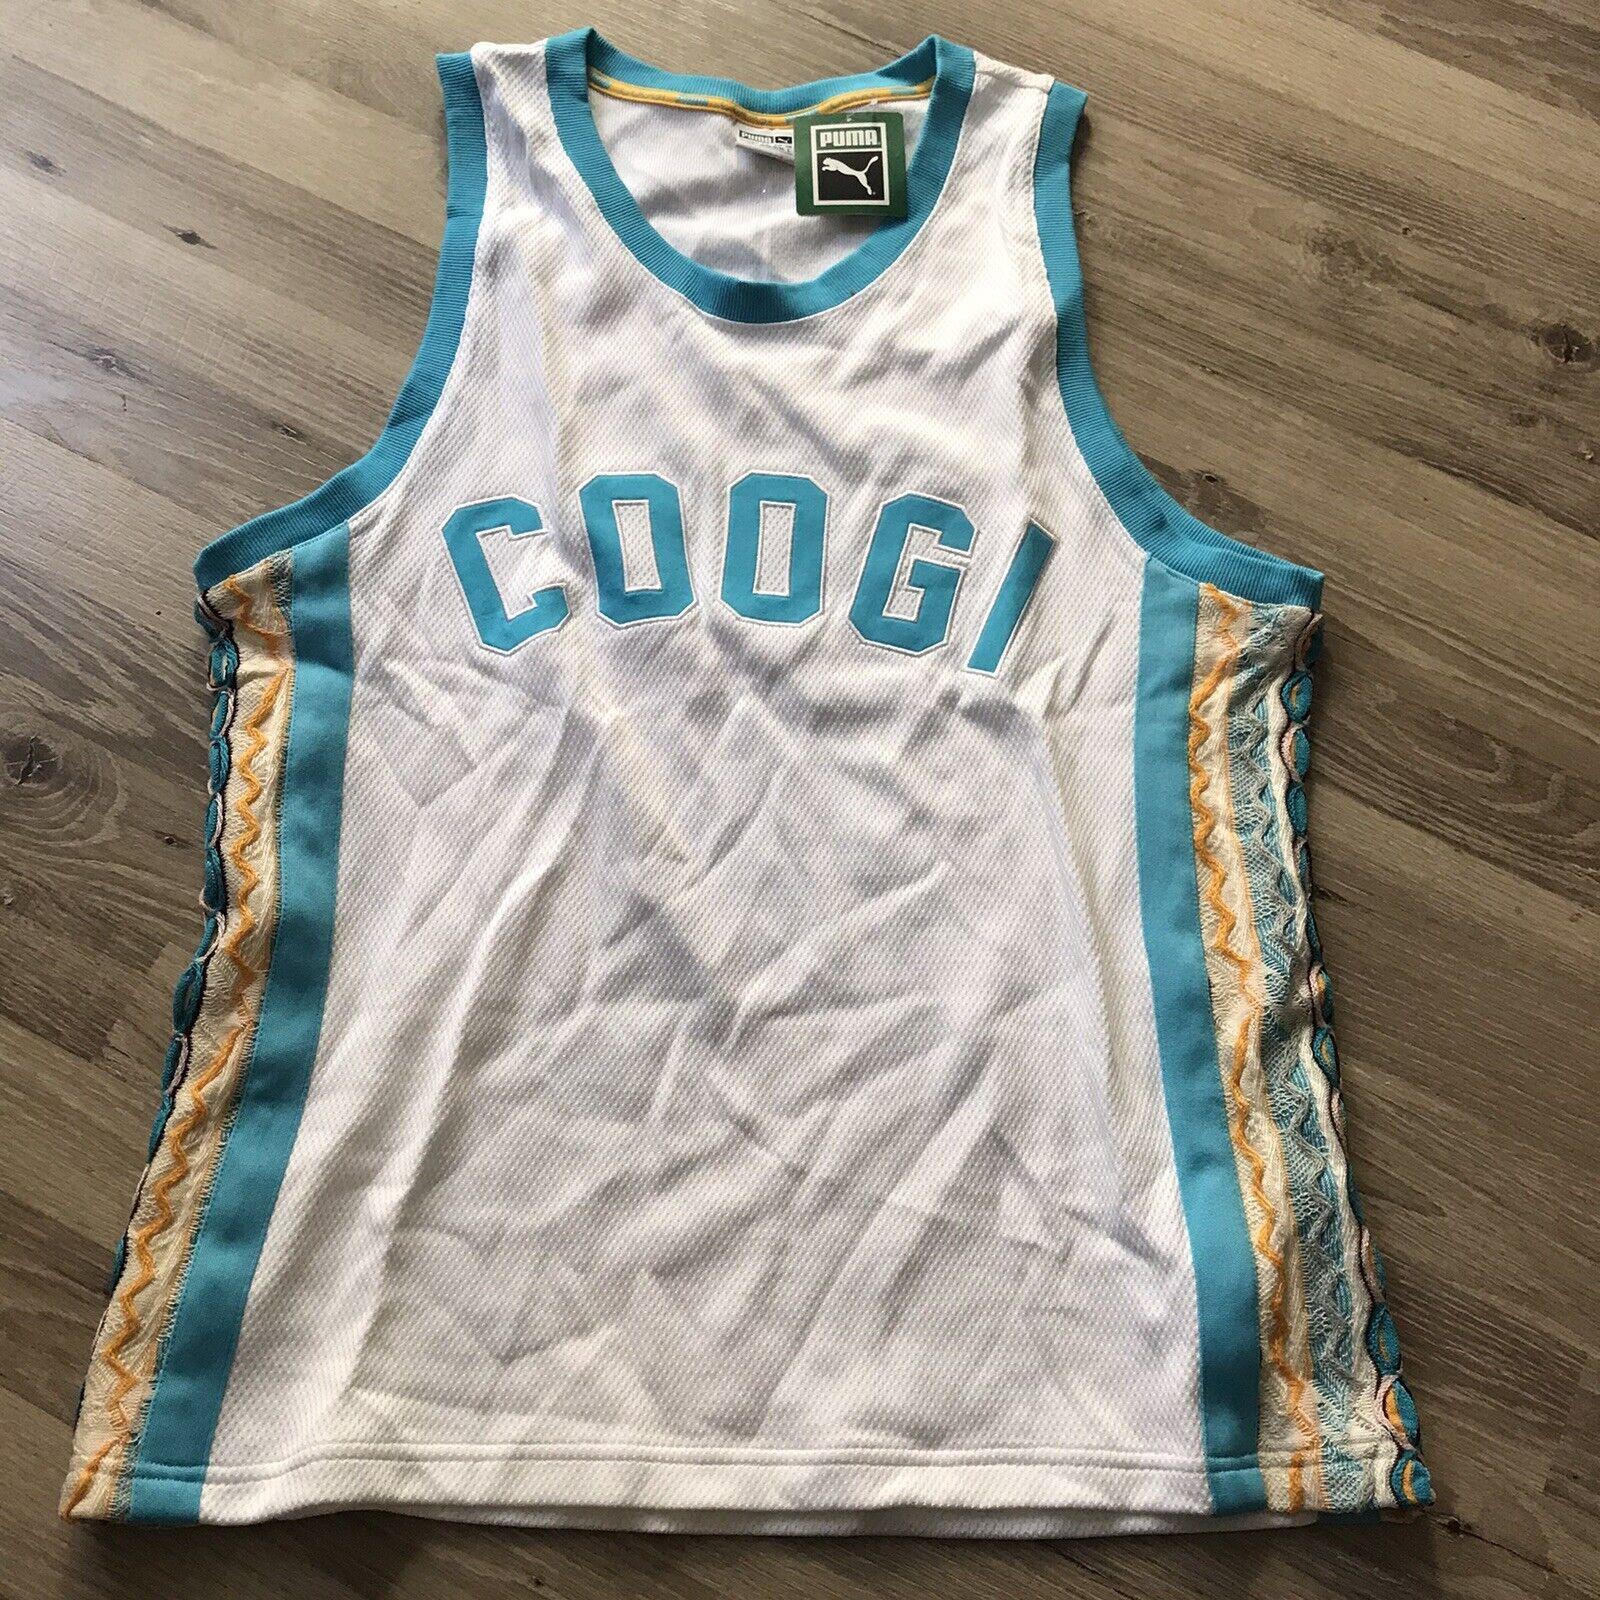 Puma x Coogi Archive Knit Tank Top Jersey White Blue Atoll Mens L NEW $120